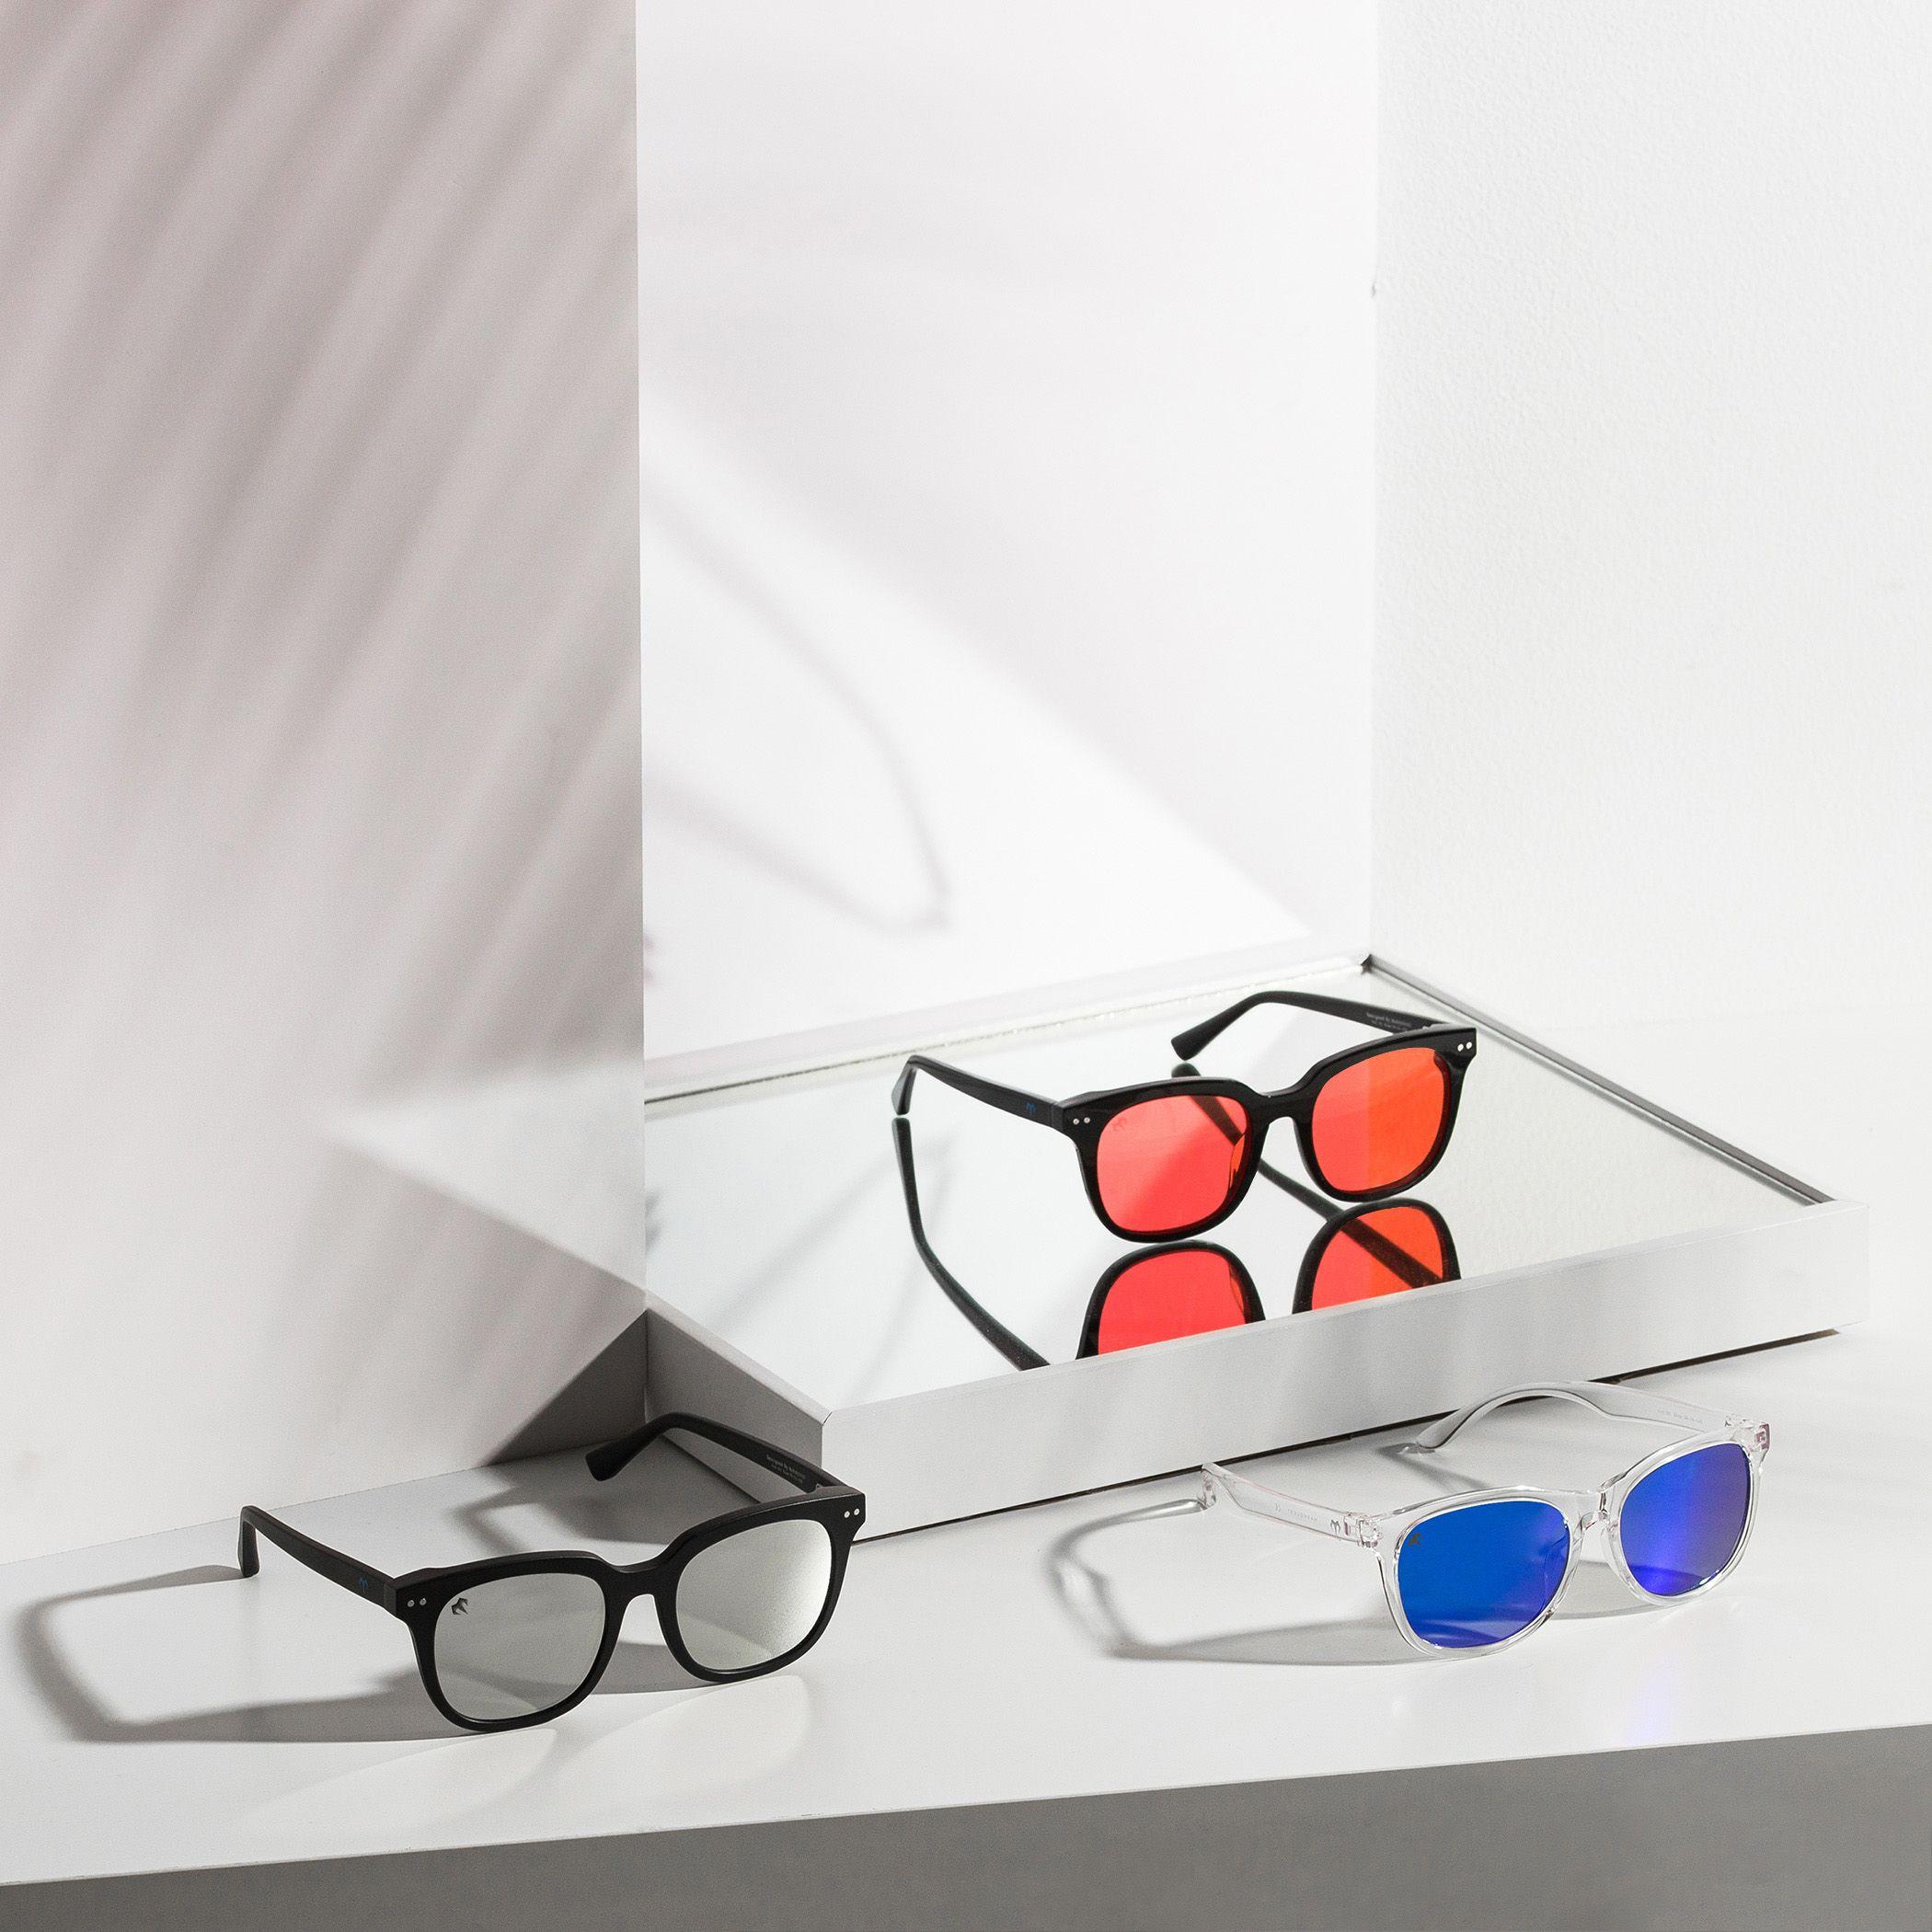 f57f97048a4 The future is bright when you wear Marsquest sunglasses. Featuring Carbon  Black x Silver